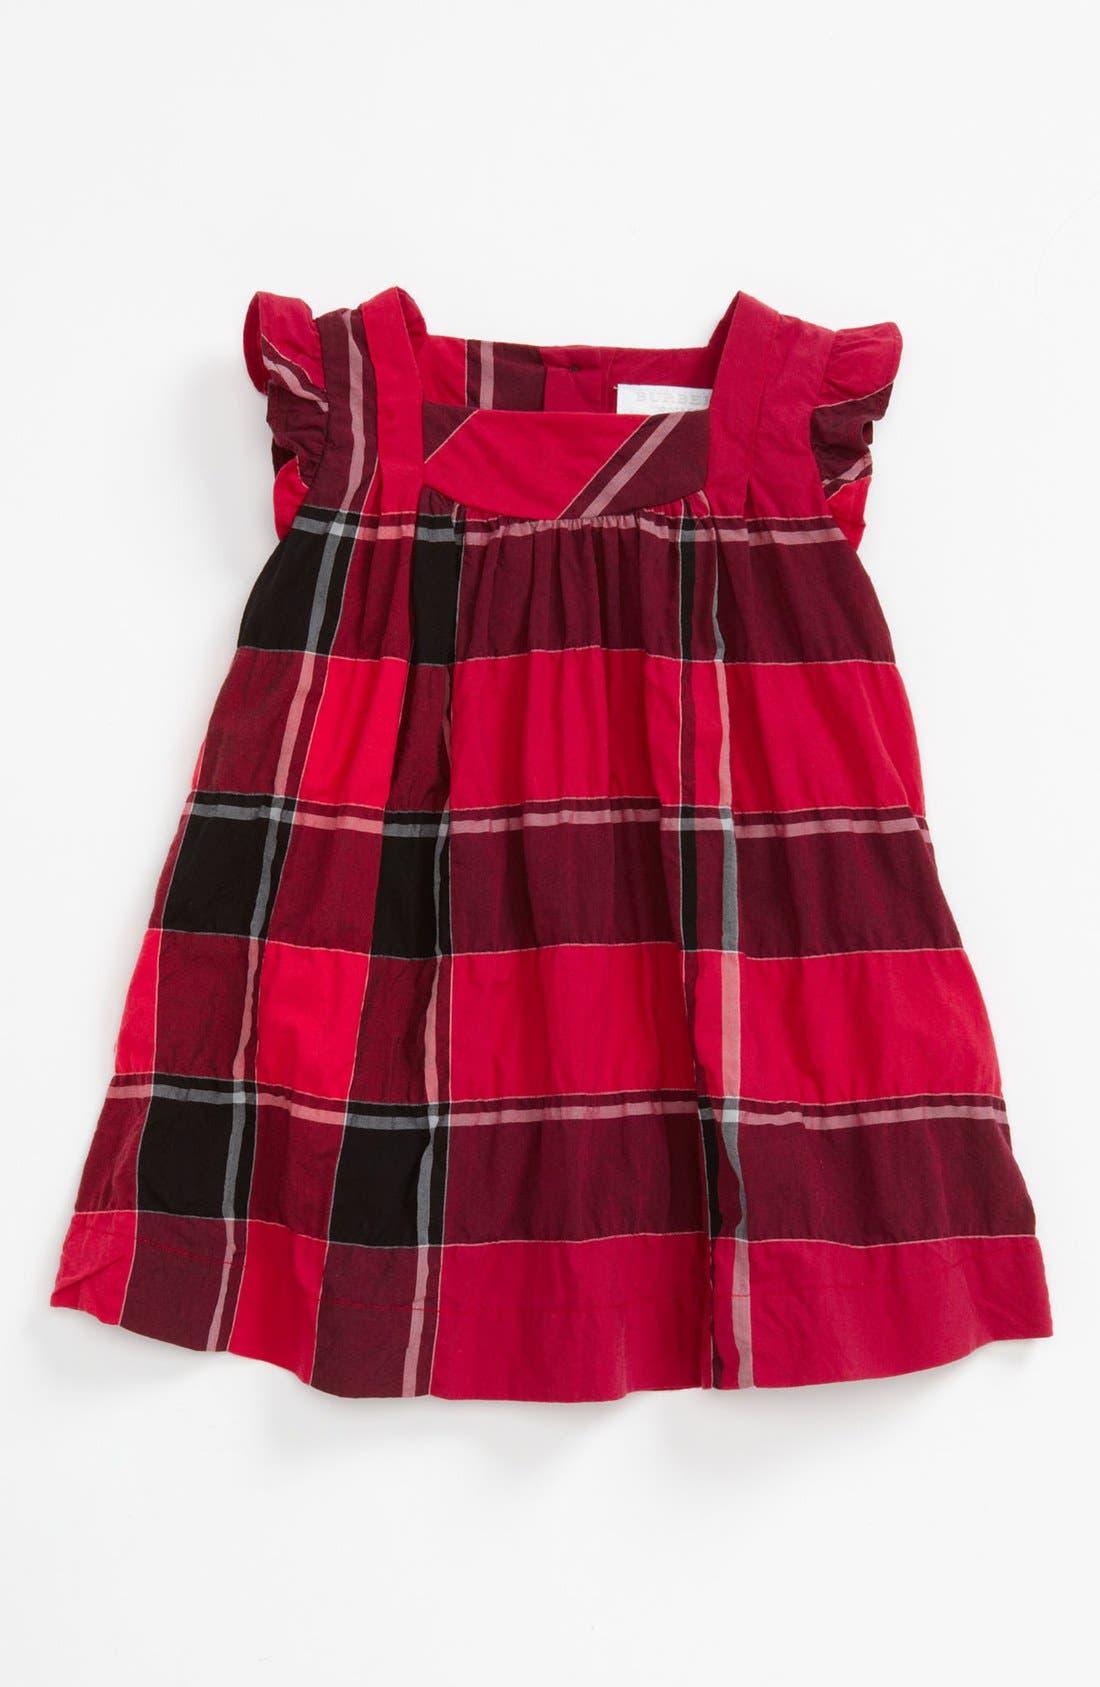 Alternate Image 1 Selected - Burberry 'Desire' Dress (Toddler Girls)